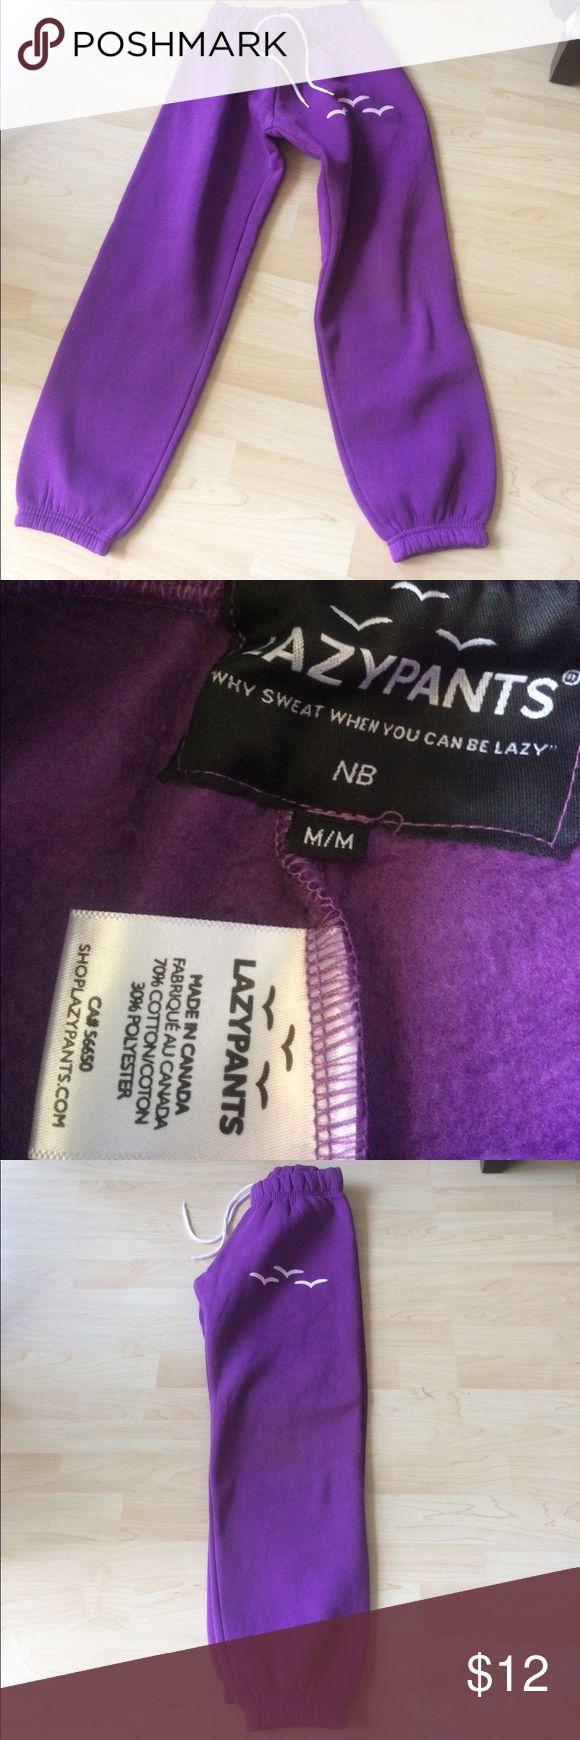 LAZYPANTS NB, M/M, 70% cotton. Brand new. New. M/M. lazzypants Pants Track Pants & Joggers